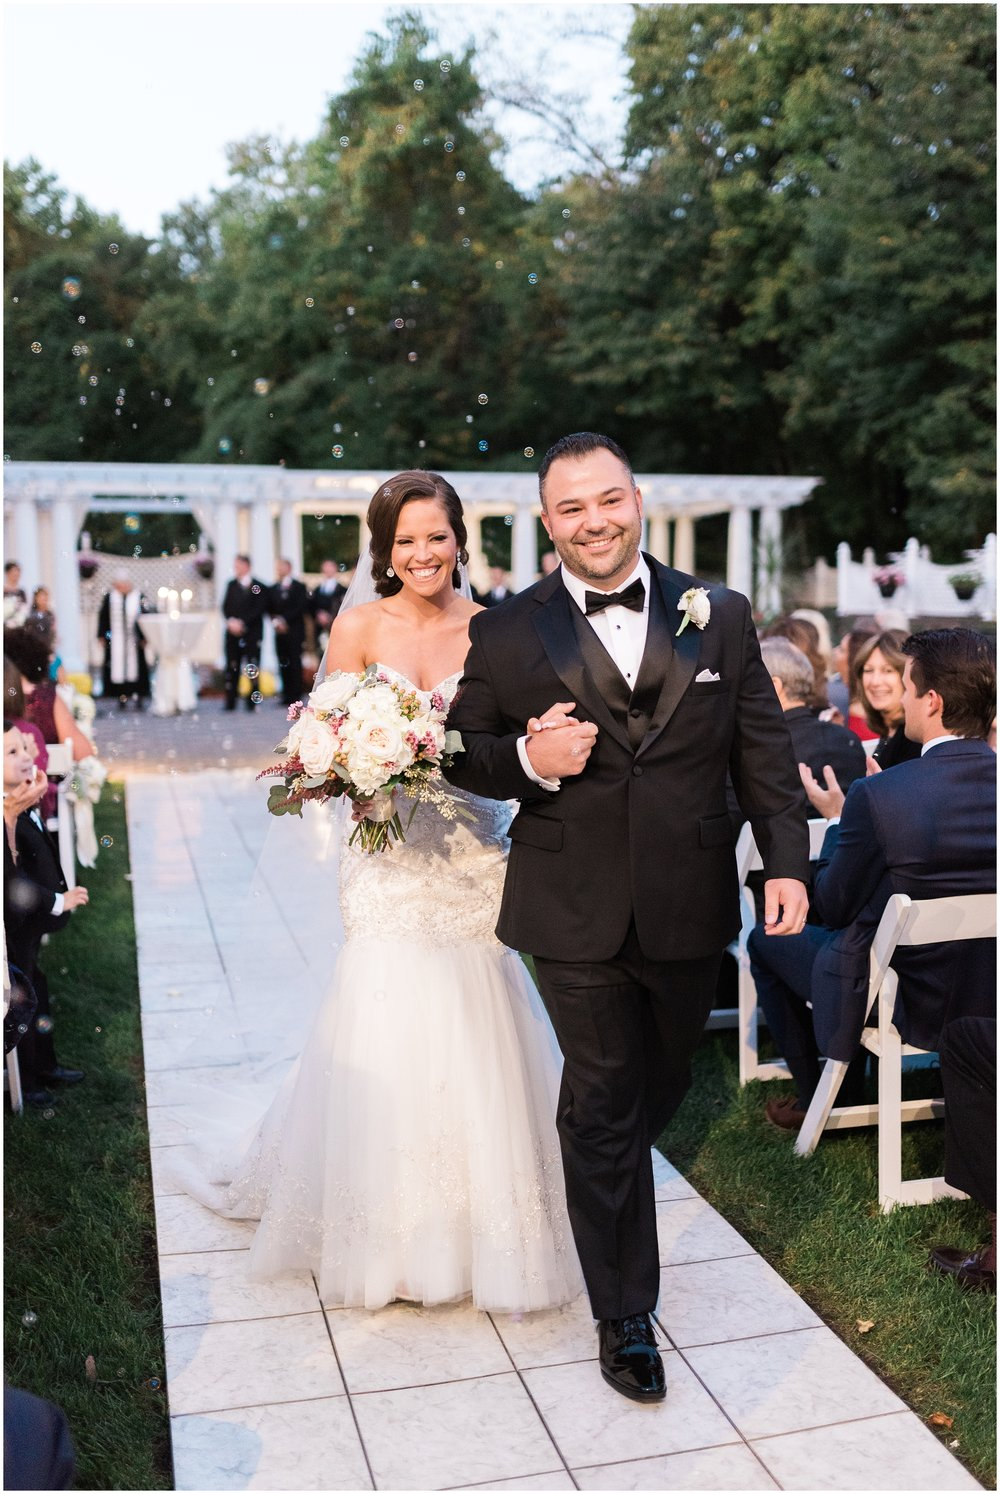 NJ-Shadowbrook-at-Shrewsbury-Classic-Wedding-photo-_0118.jpg